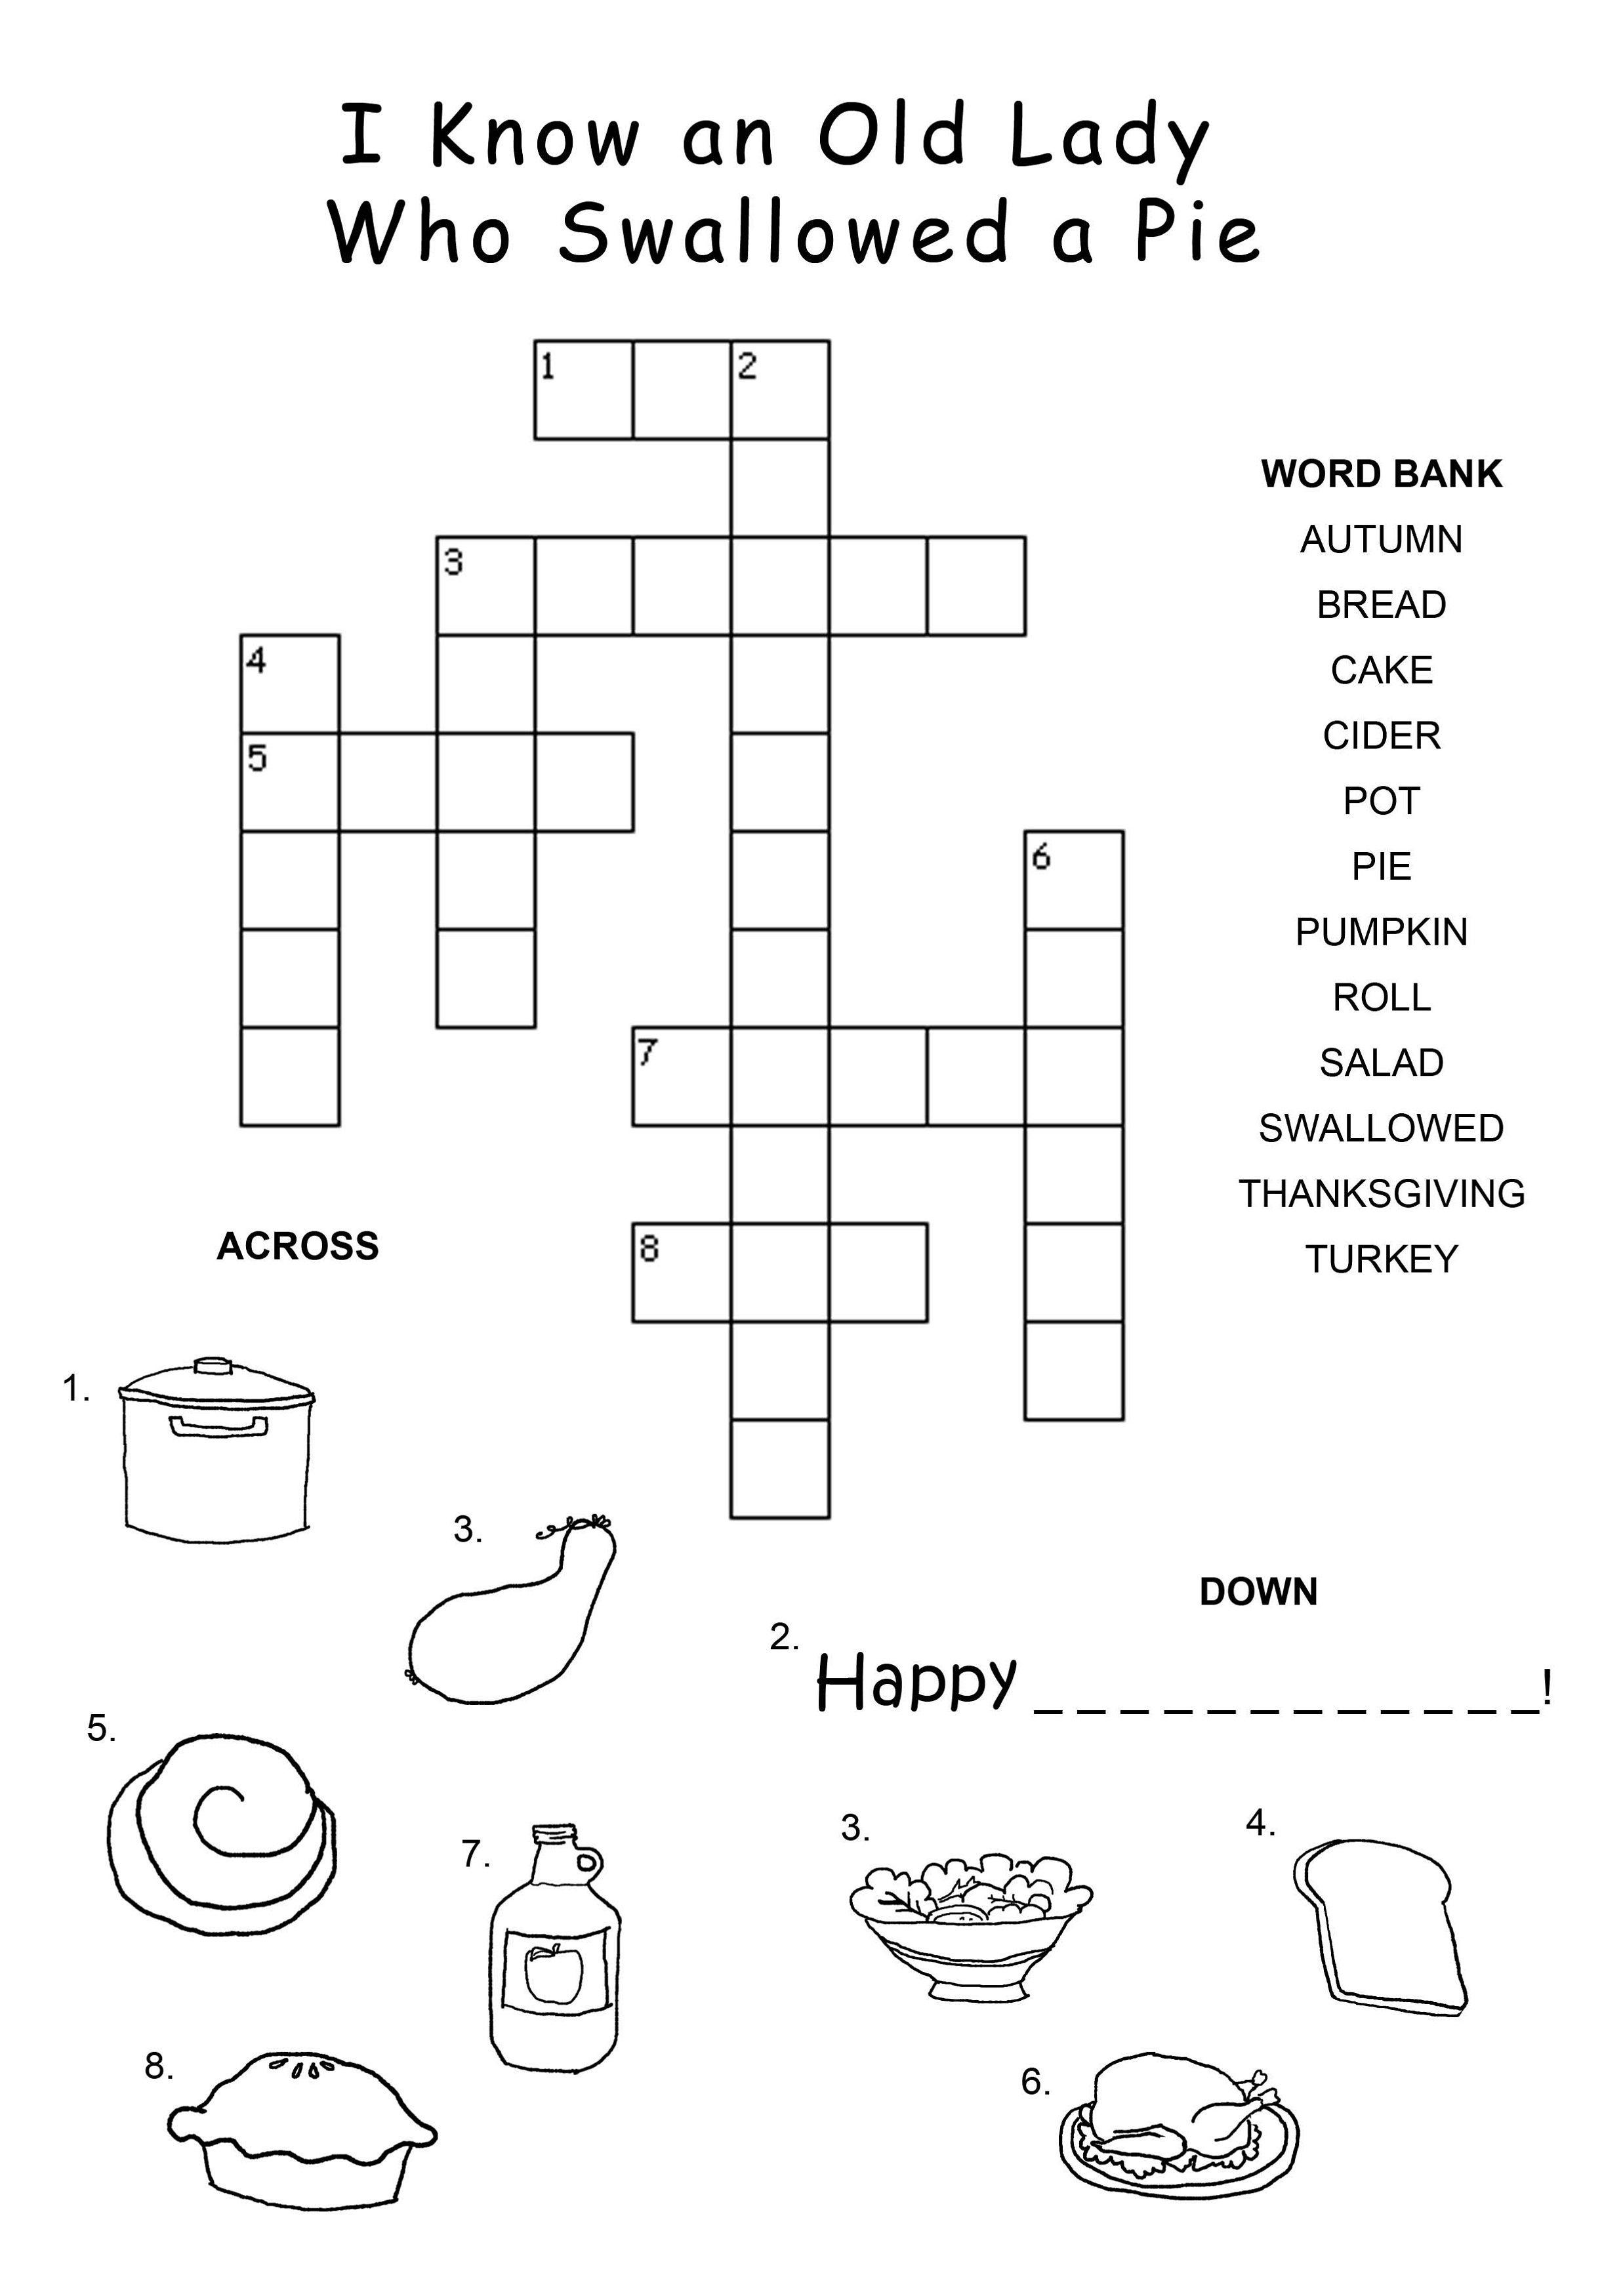 Easy-Crossword-Puzzles-For-Kids-Happy   Ot Fun   Thanksgiving - Crossword Puzzles For Kindergarten Free Printable